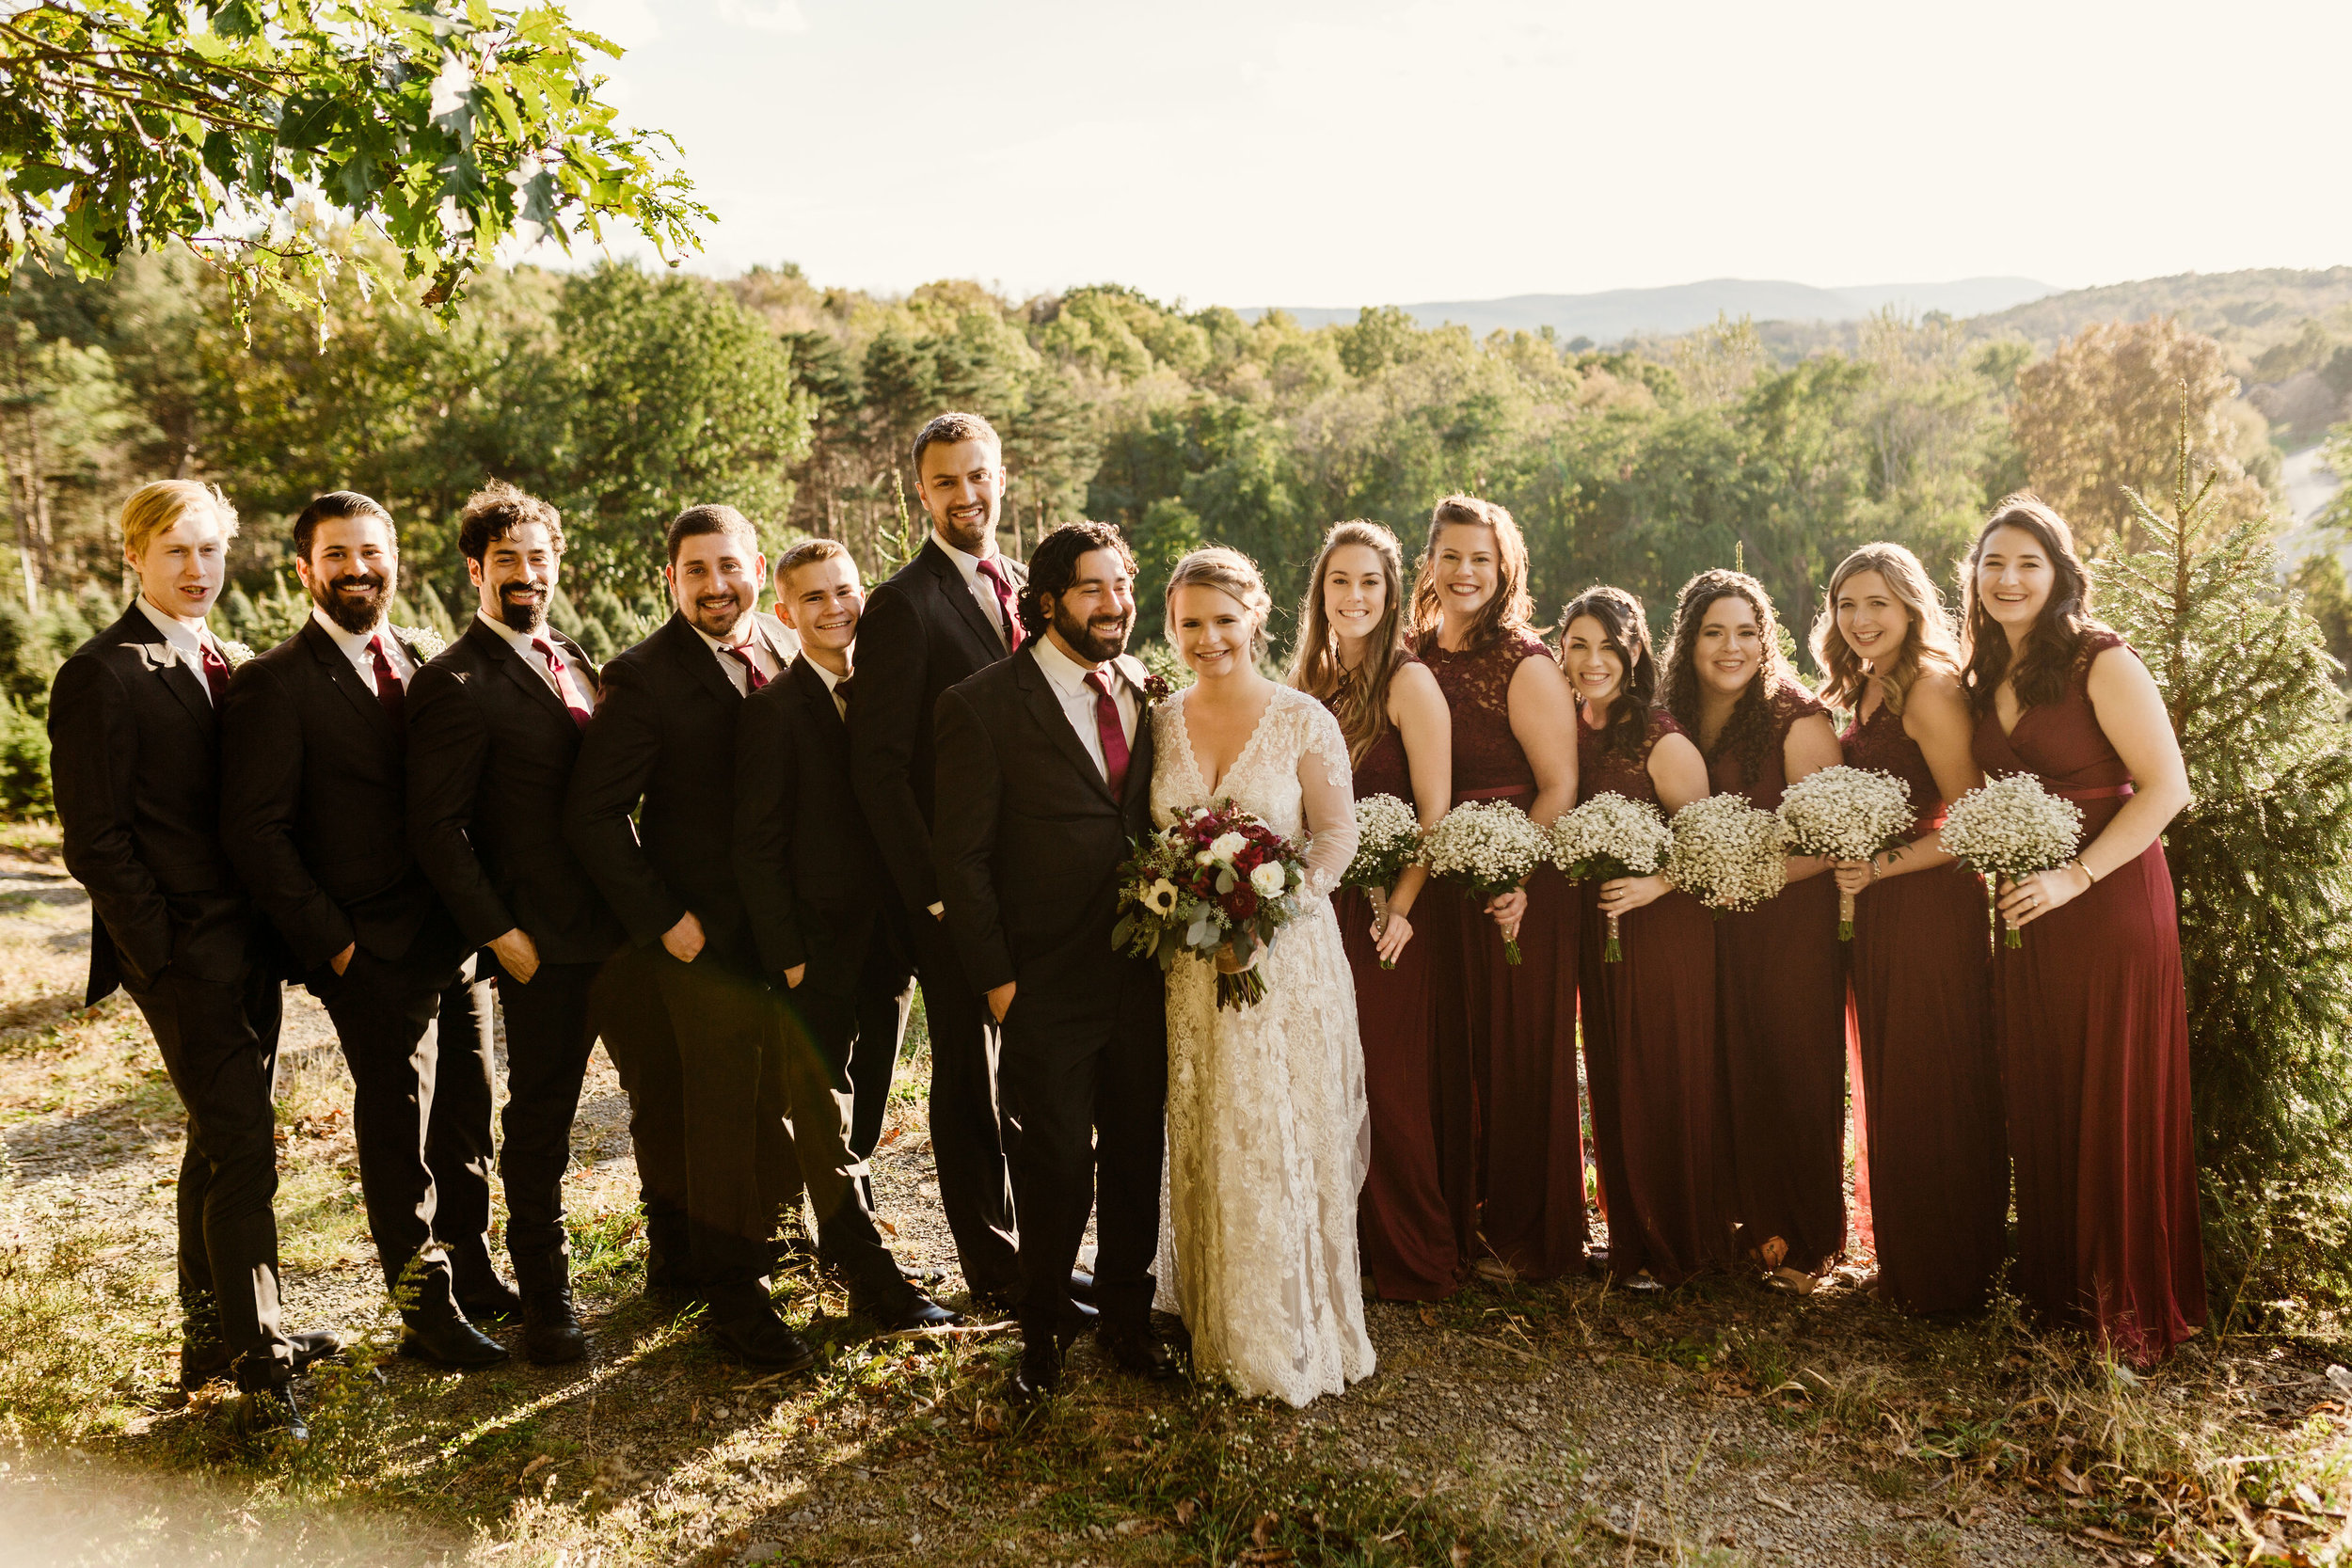 young-love-media-rustic-fall-autumn-wedding-emmerich-tree-farm-hudson-valley-warwick-new-york-ceremony-70.jpg